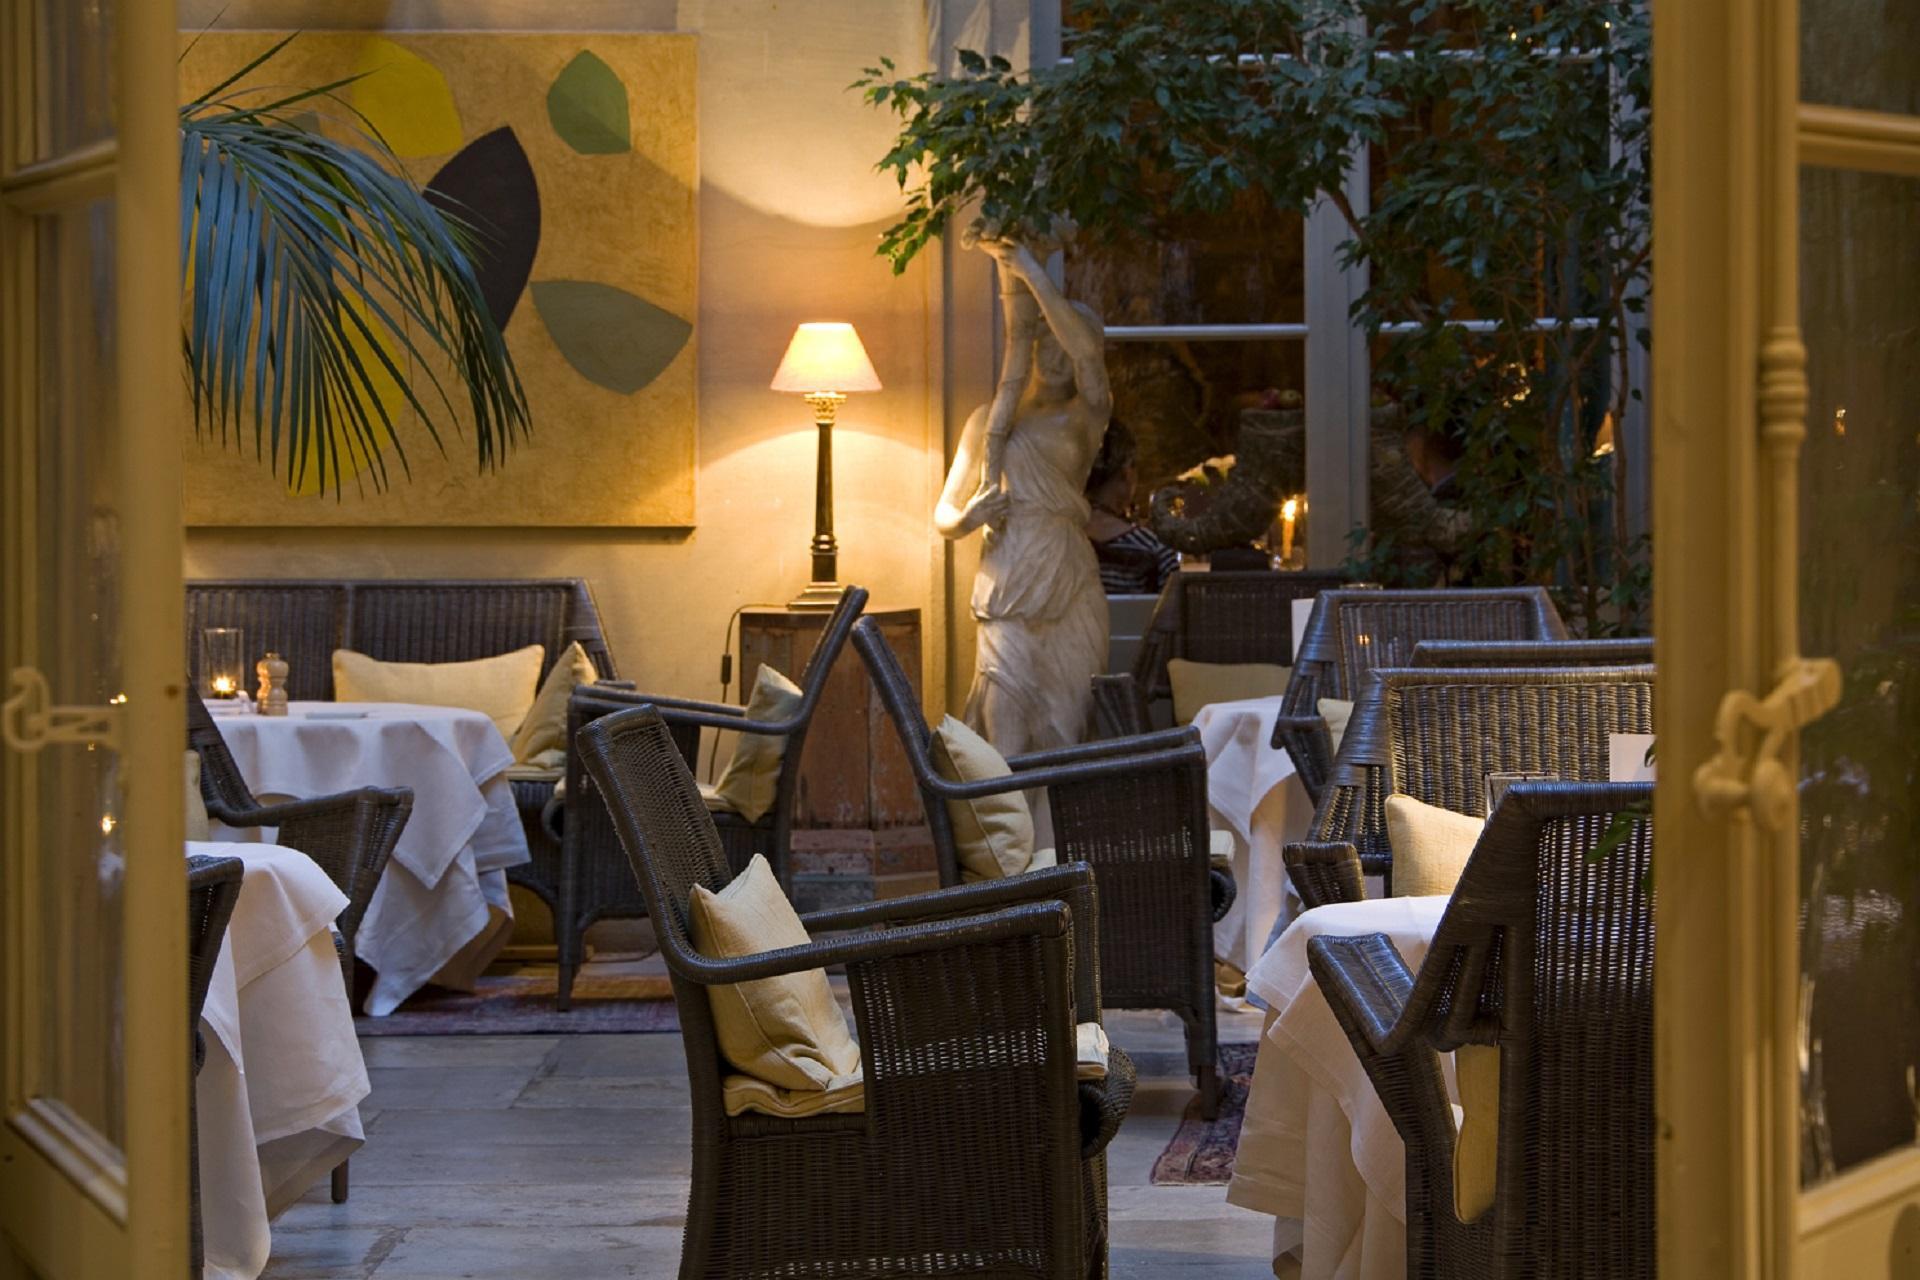 la-mirande-avignon-provence-luberon-reunion-seminaires-de-caractere-restaurant